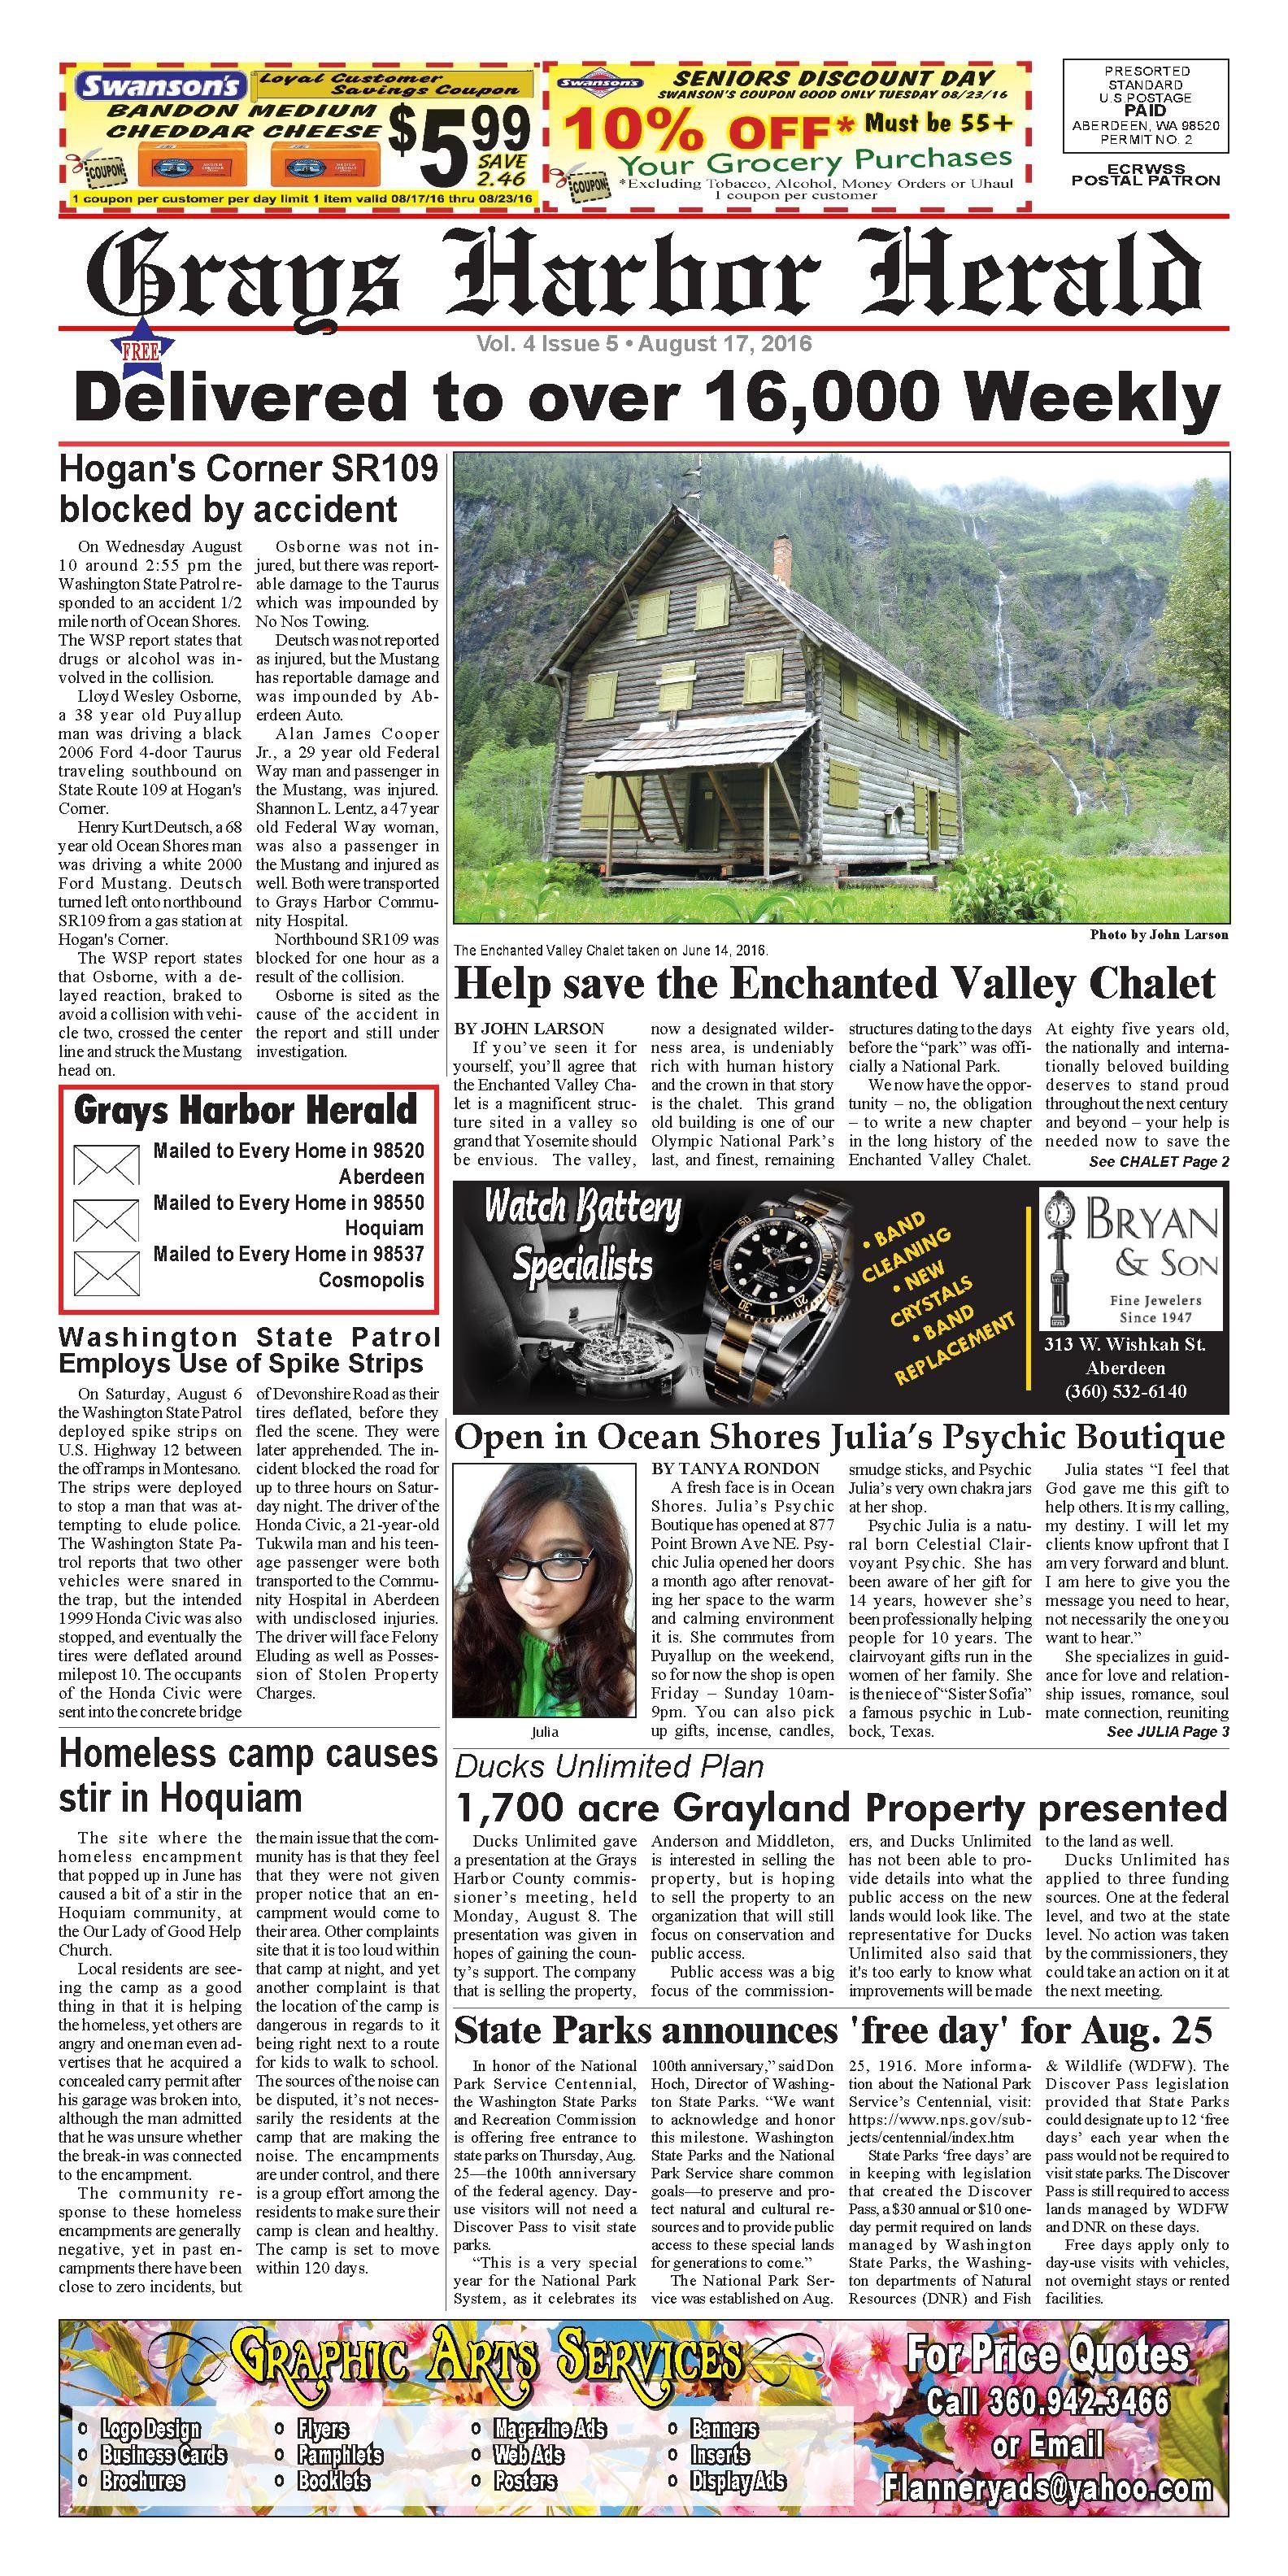 Grays Harbor Herald August 17, 2016 | #SWWA in the news